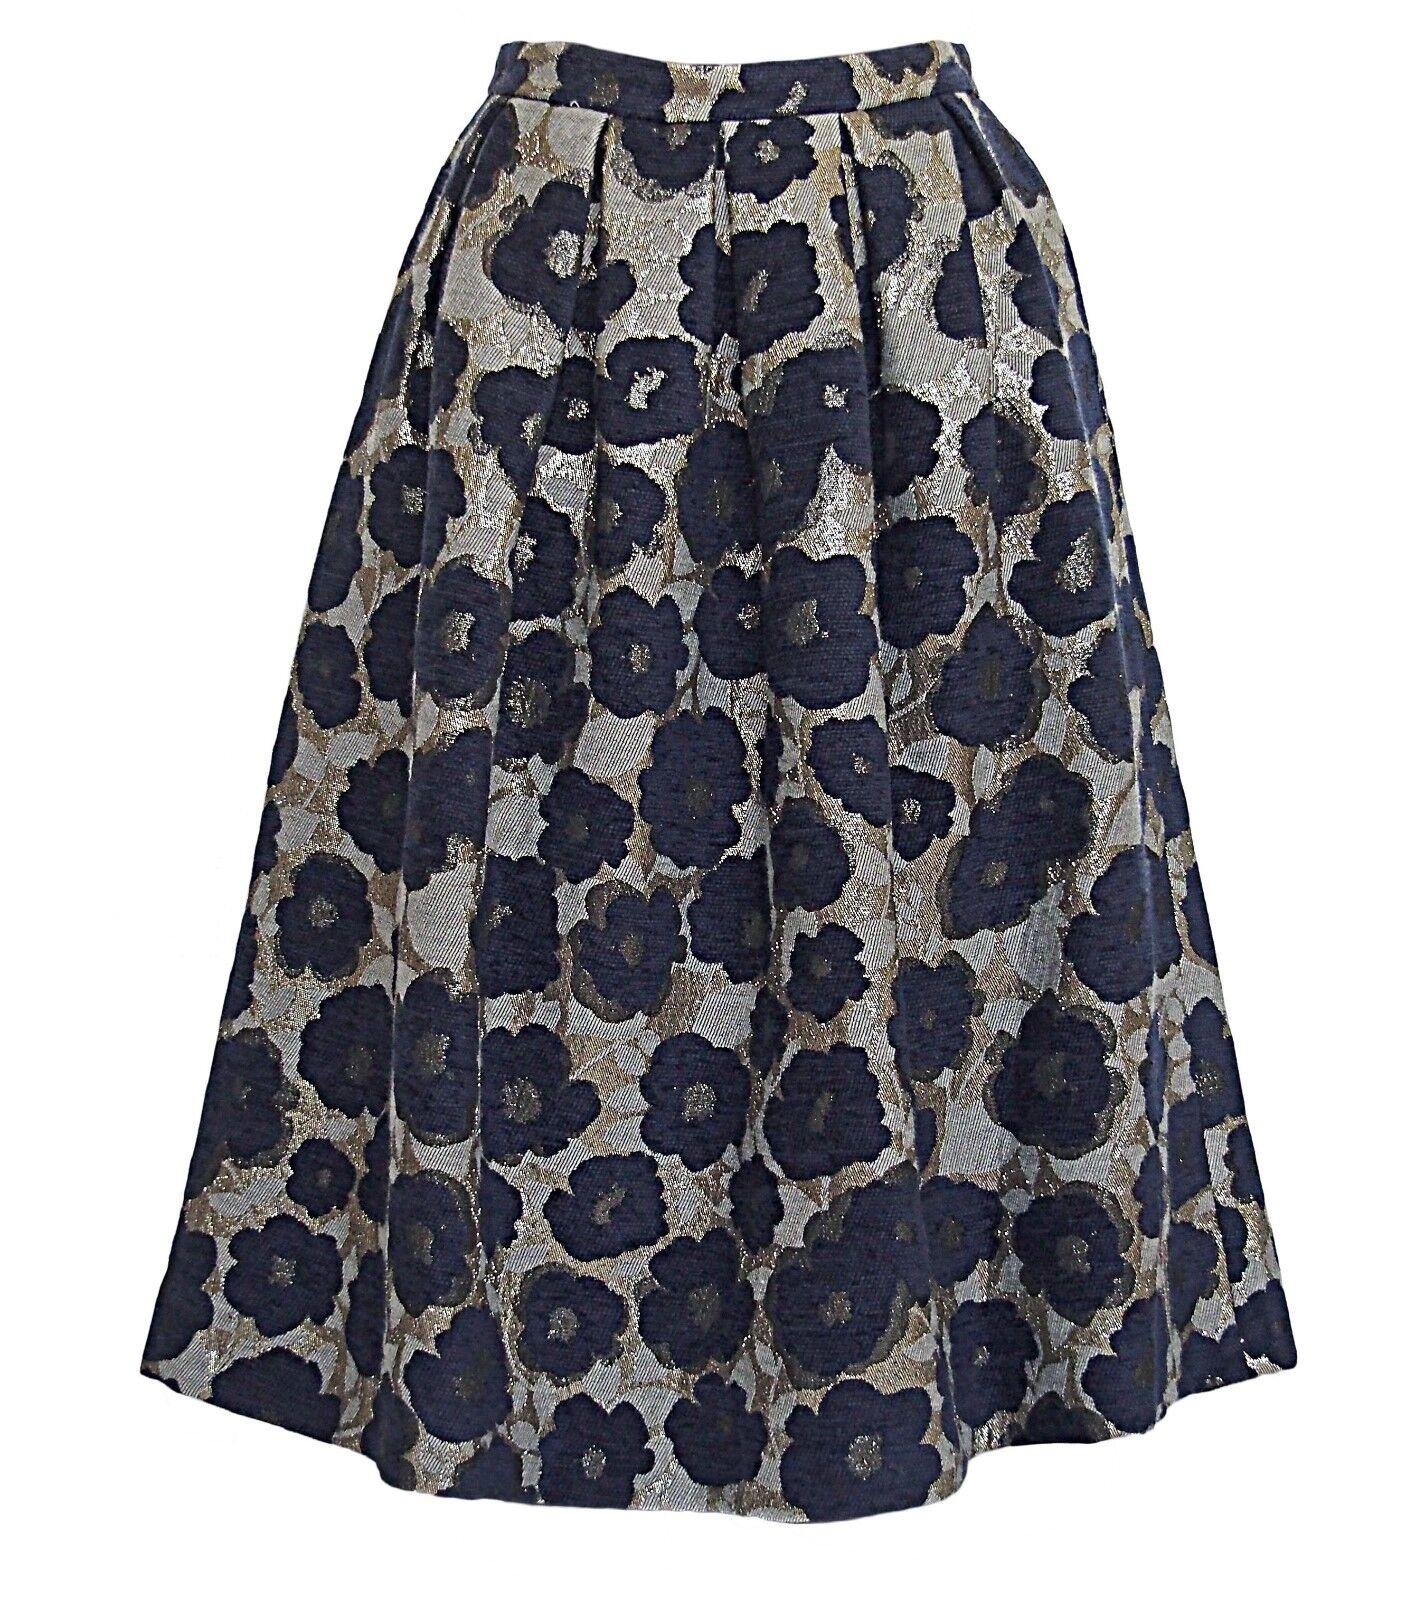 DRESS GALLERY France Pleated Skirt Flower Metallic Jacquard Size M